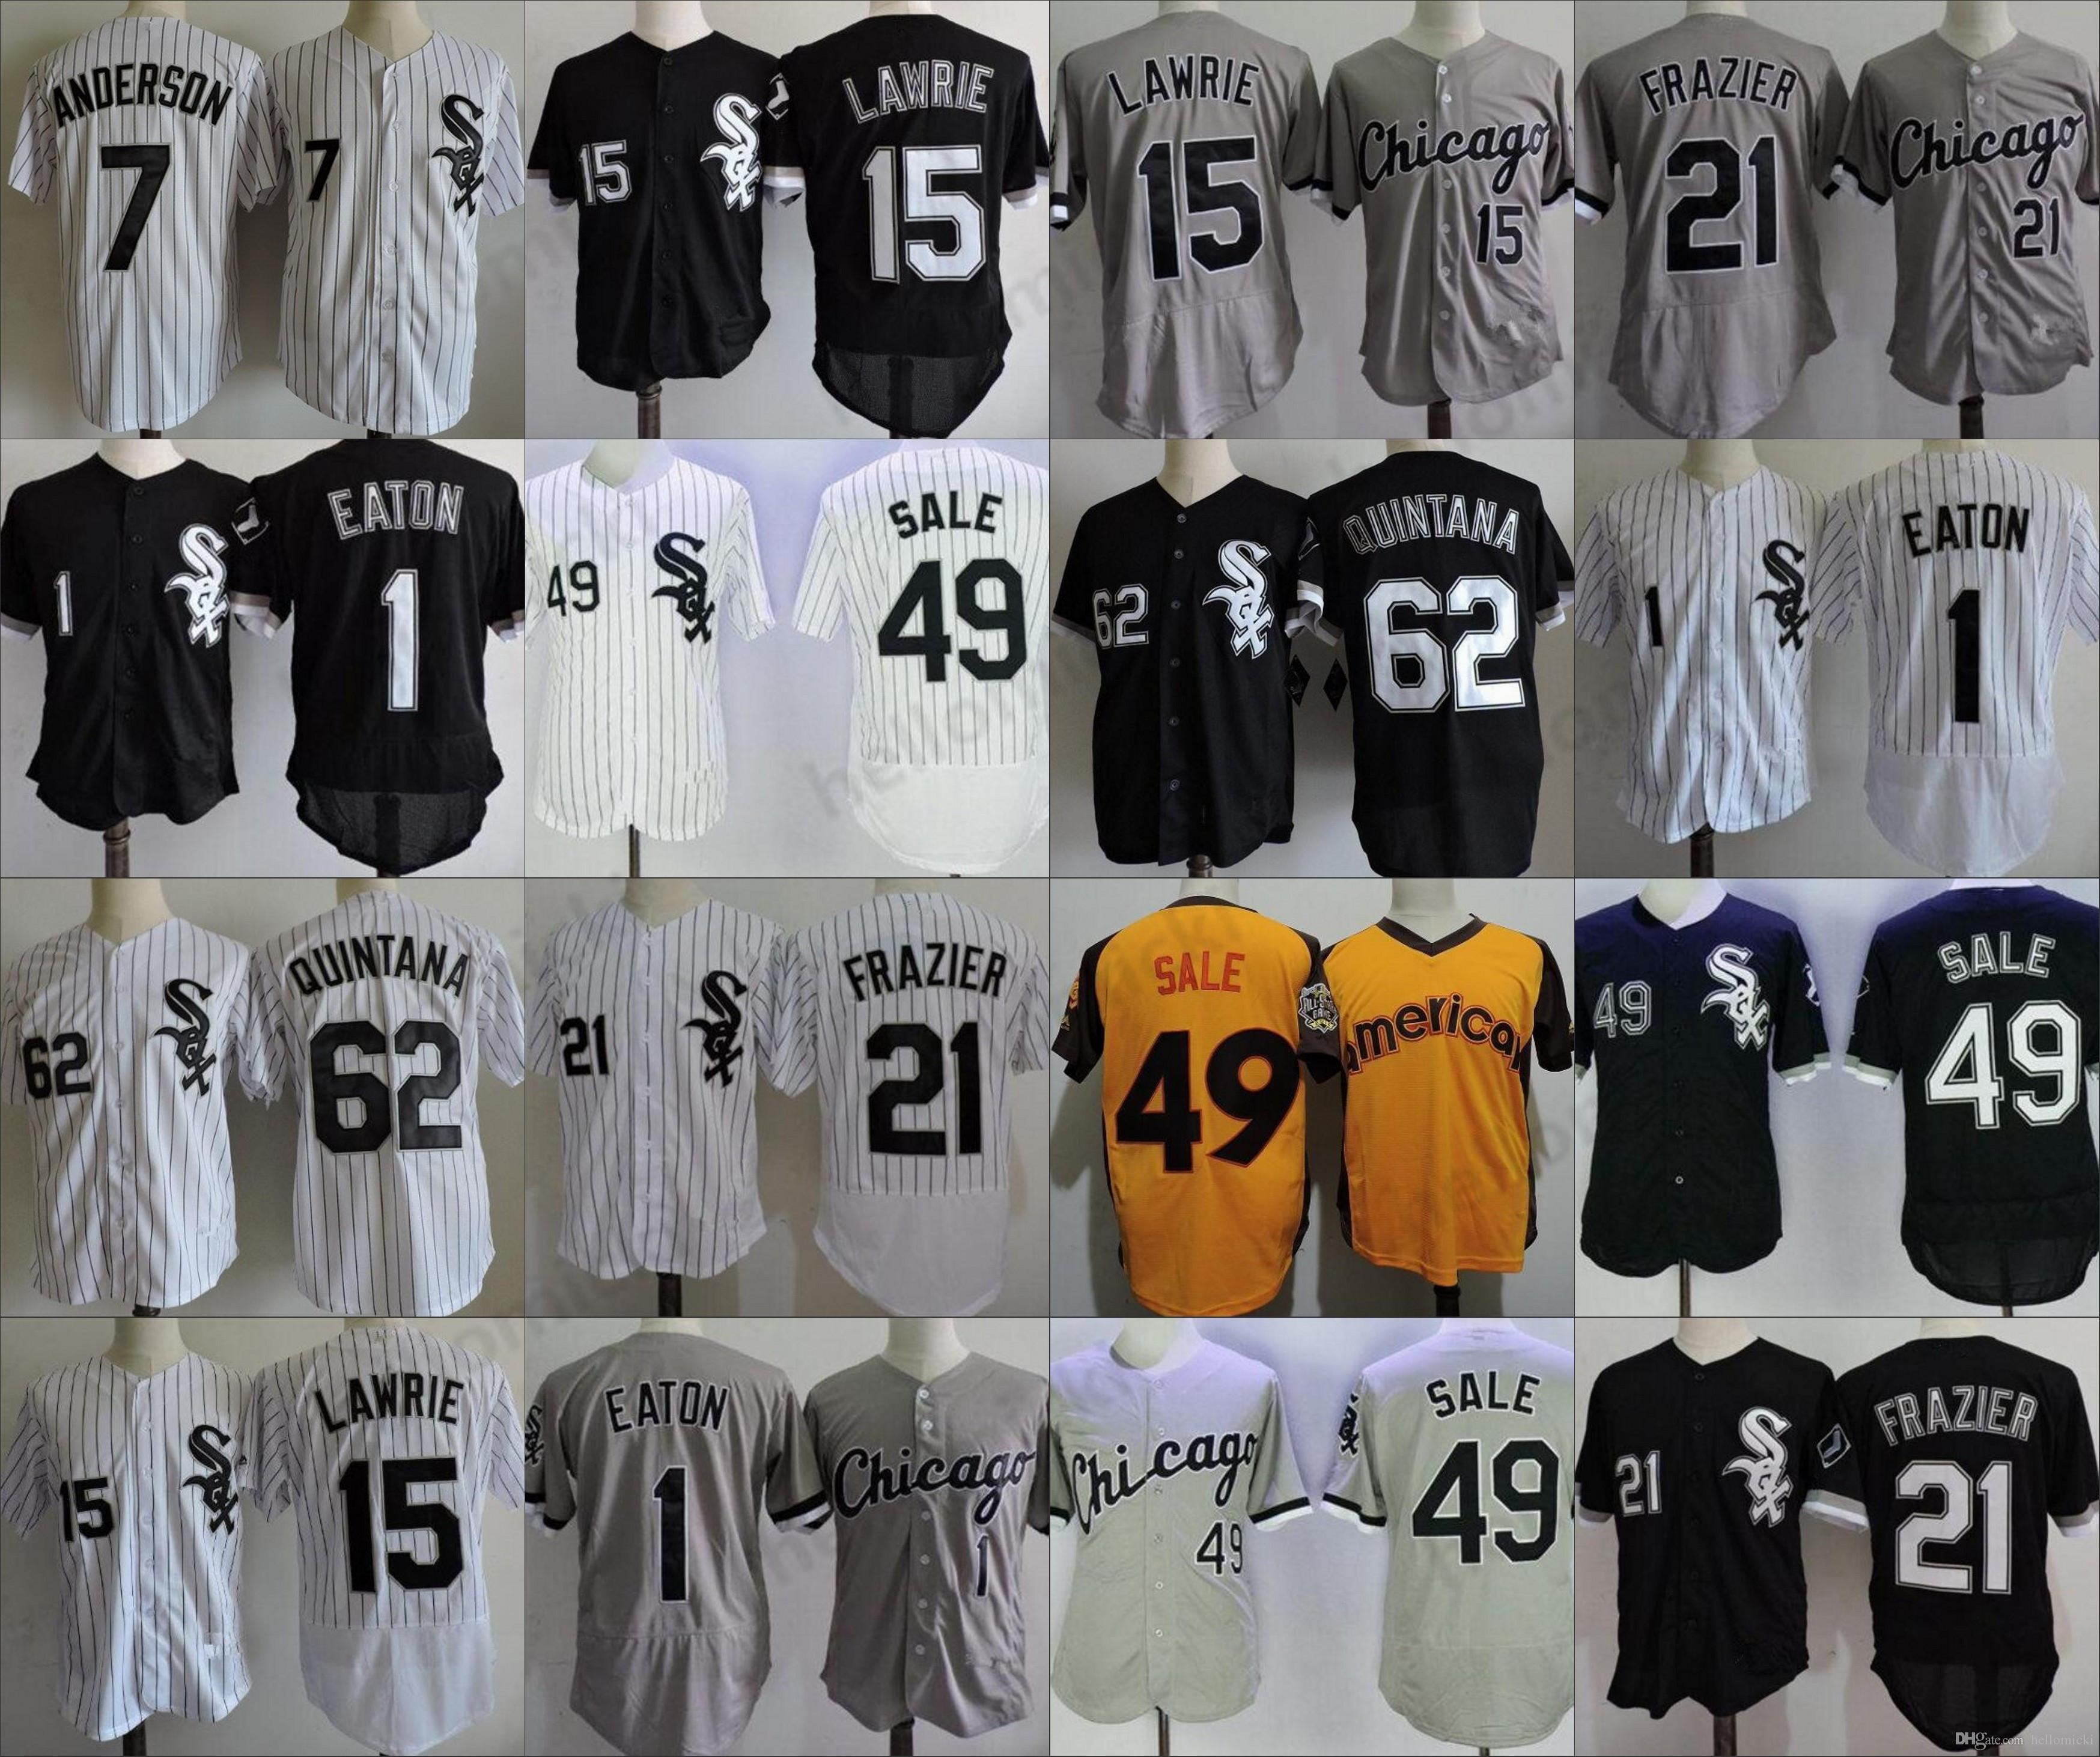 hot sale online ccdfe c05c4 Mens baseball jersey Jose Quintana 1 Adam Eaton 15 Brett Lawrie 21 Todd  Frazier 49 Chris Sale stitched jerseys